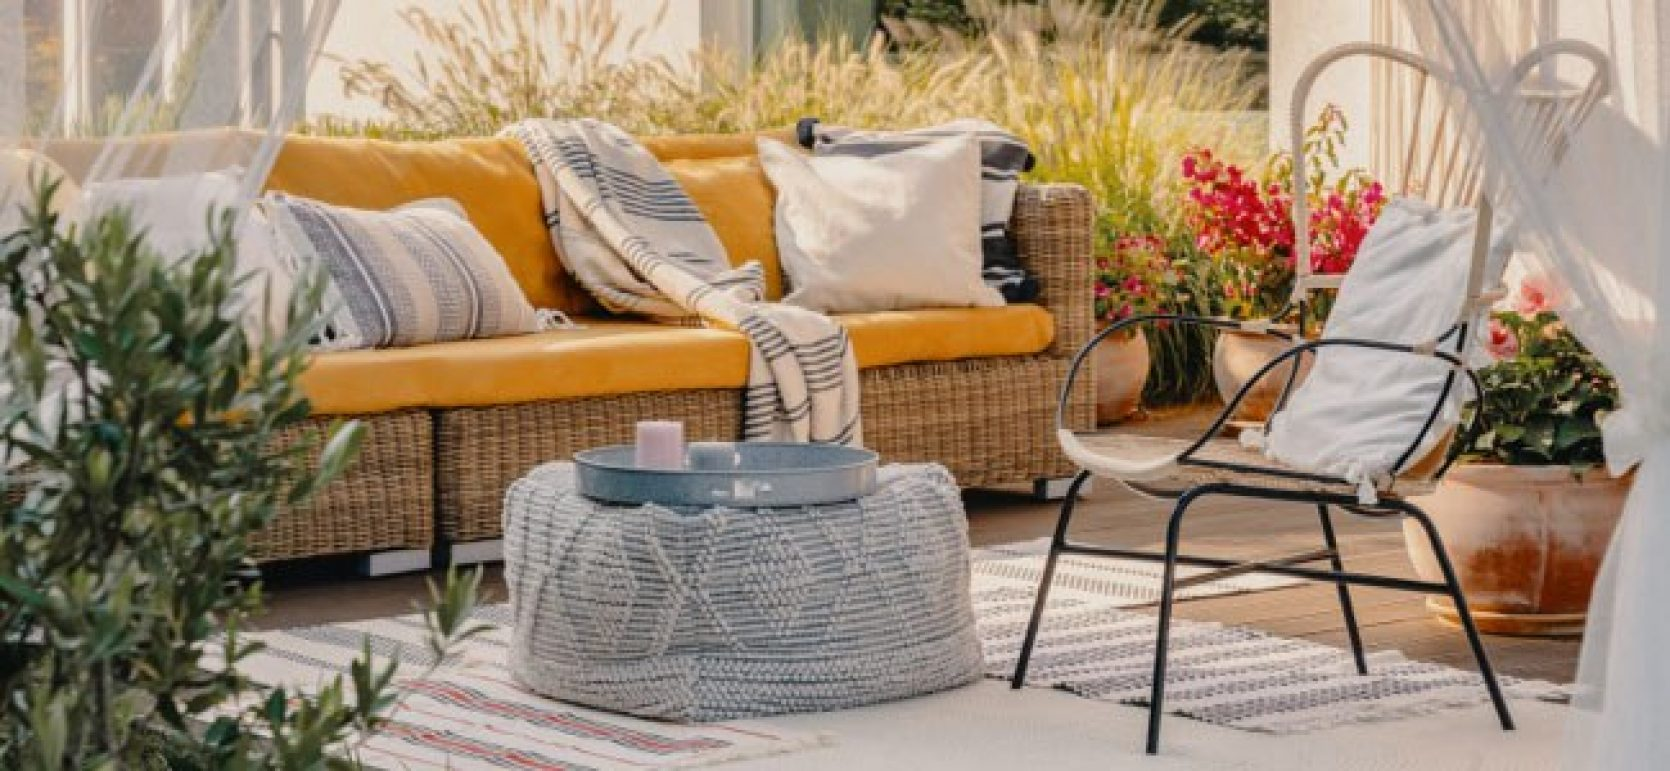 Platting med utemøbler i lyse farger og moderne tekstiler. Beplantning i krukker.